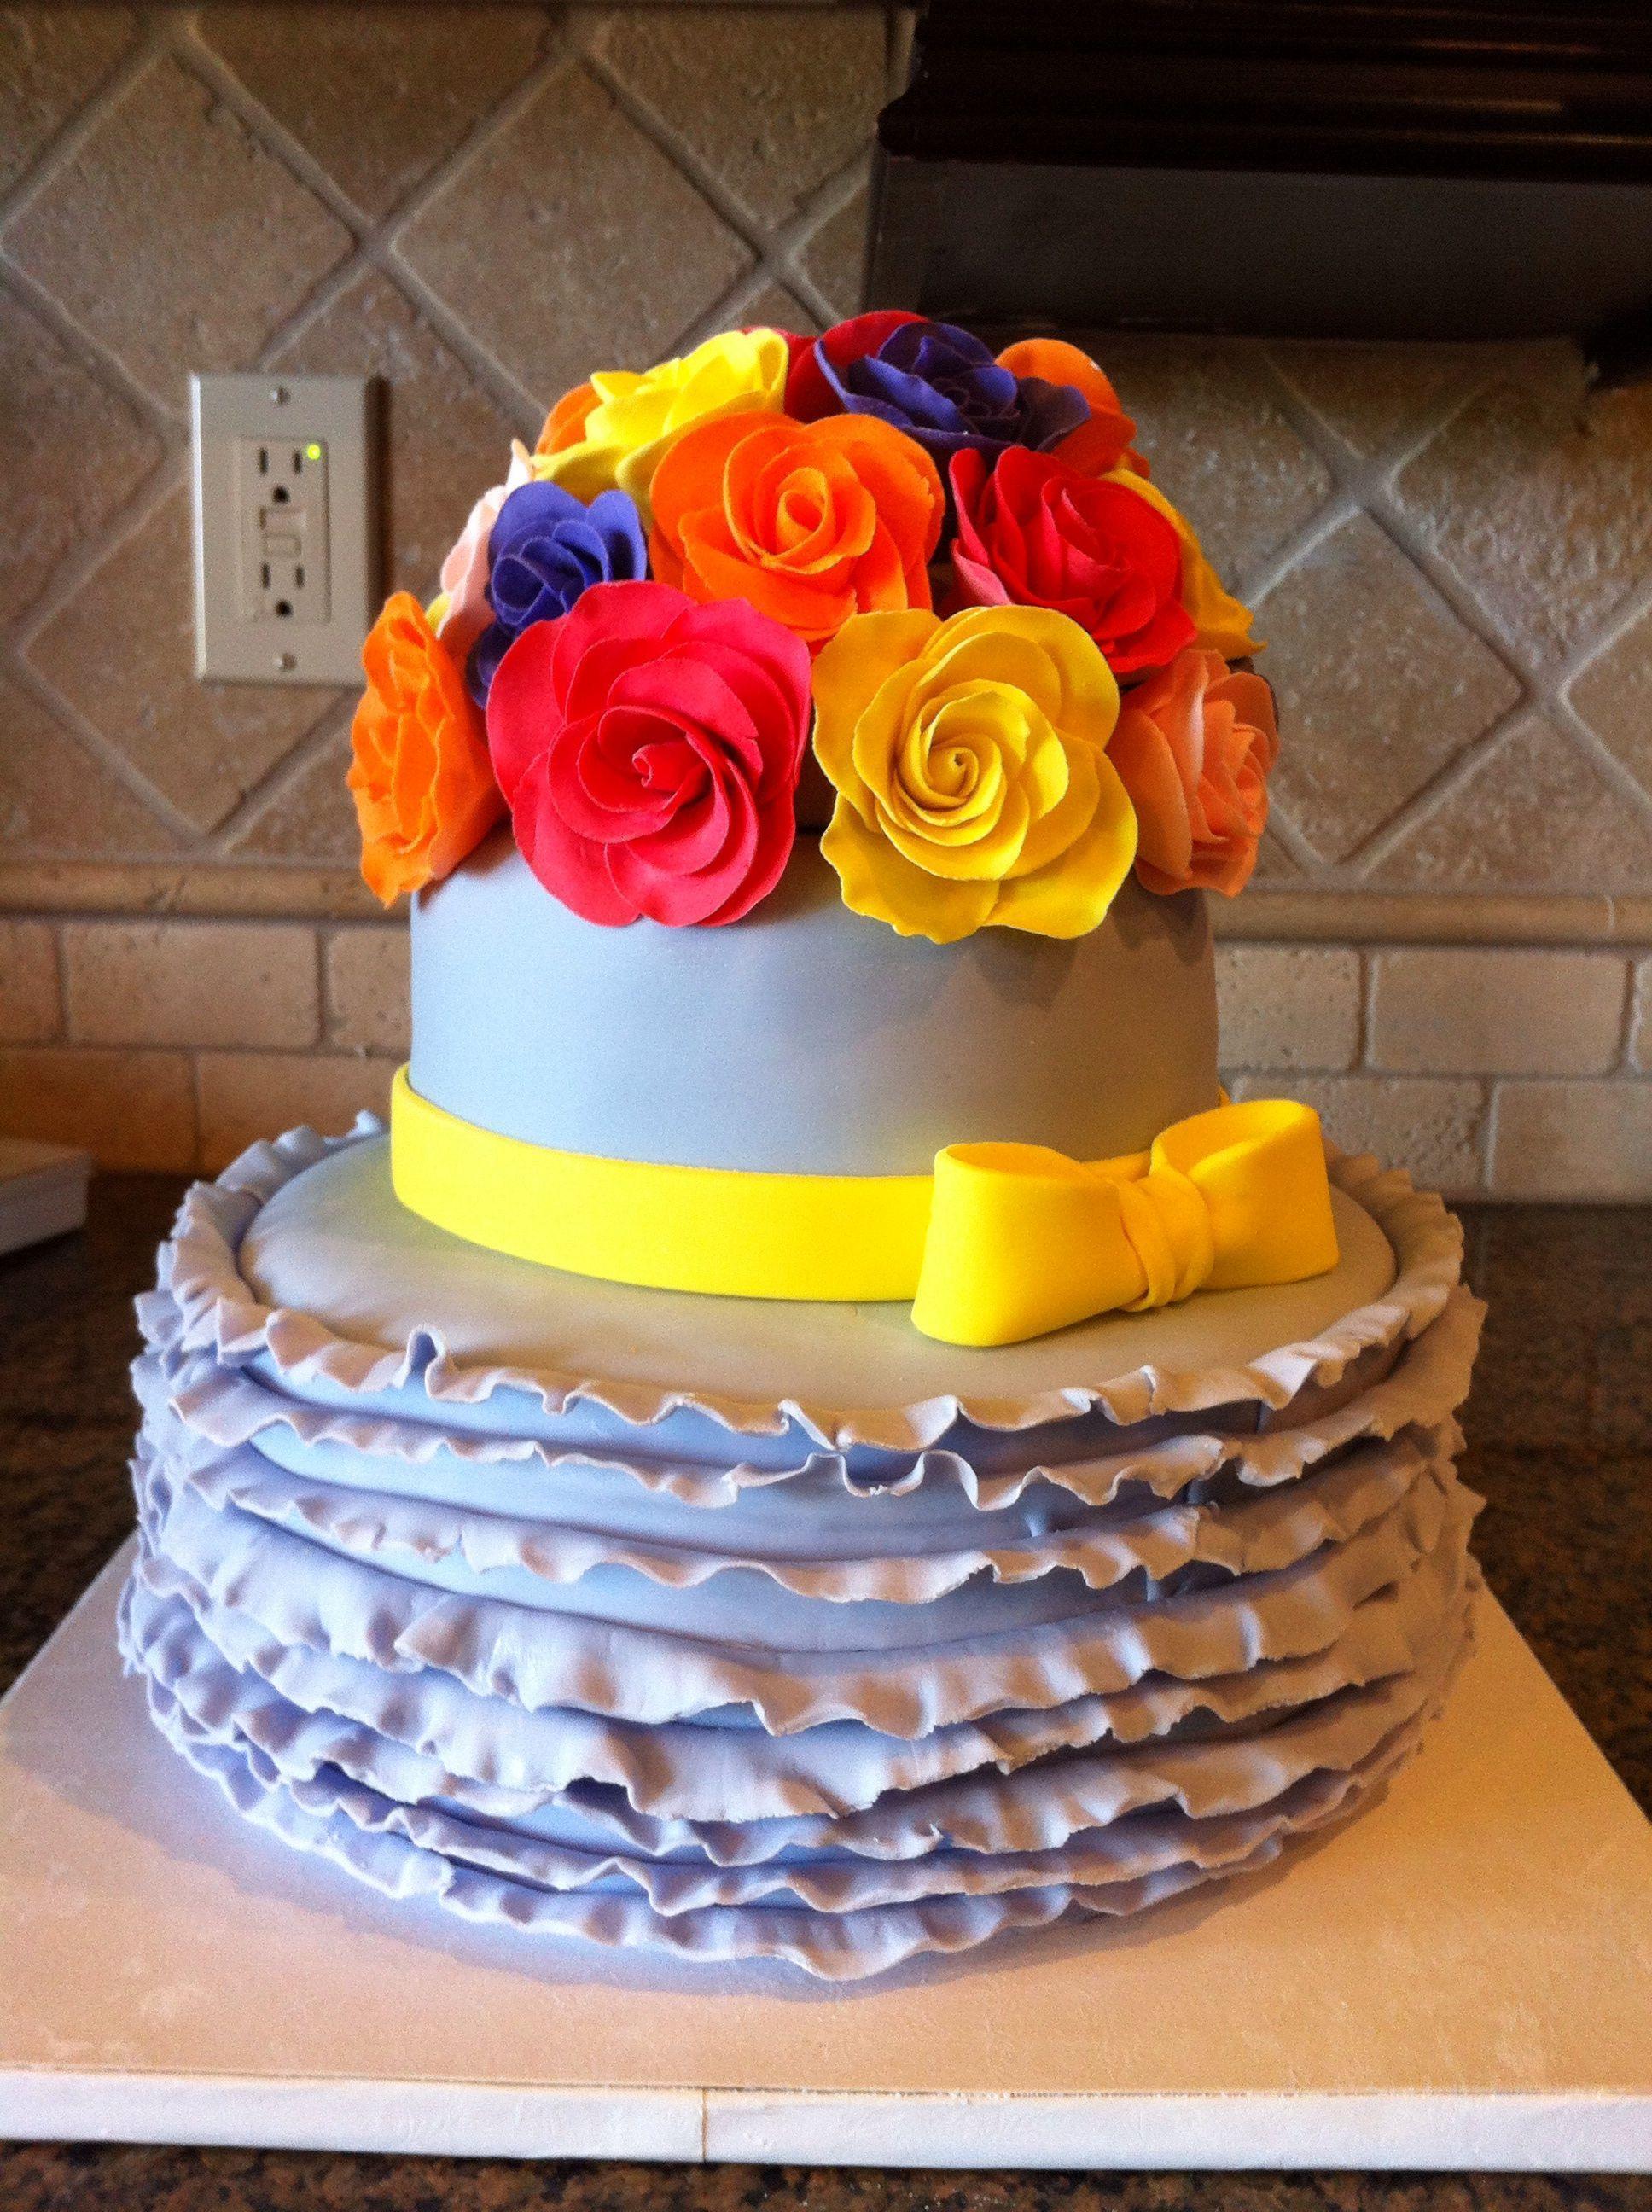 80th birthday cake for grandma